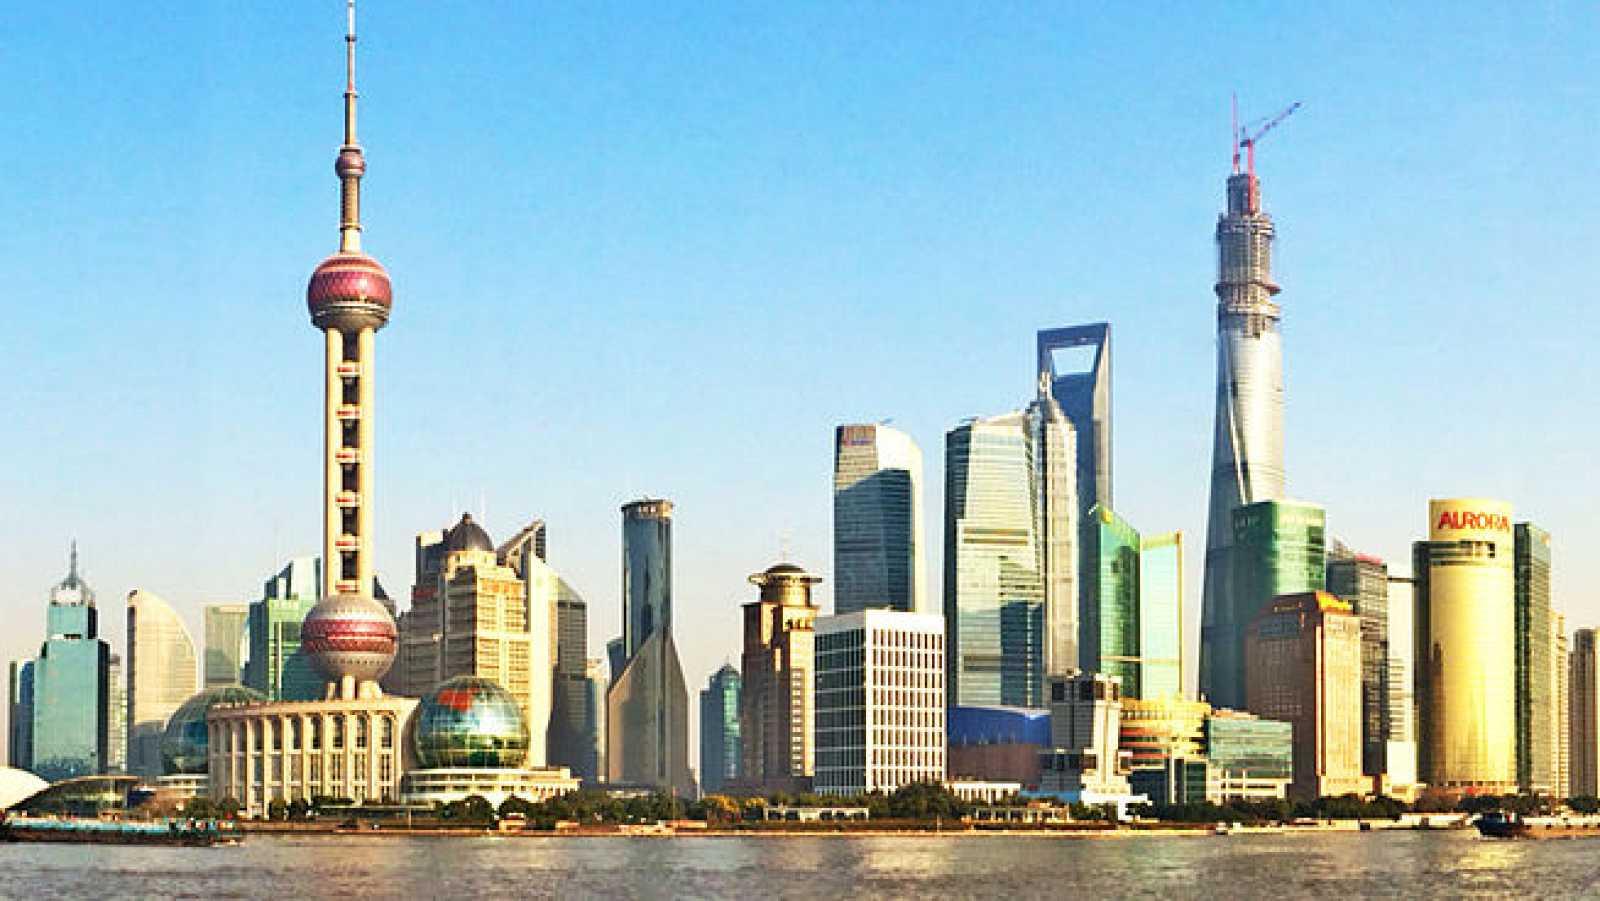 Nómadas - Shanghái, motor económico de China - 07/01/12 - Escuchar ahora